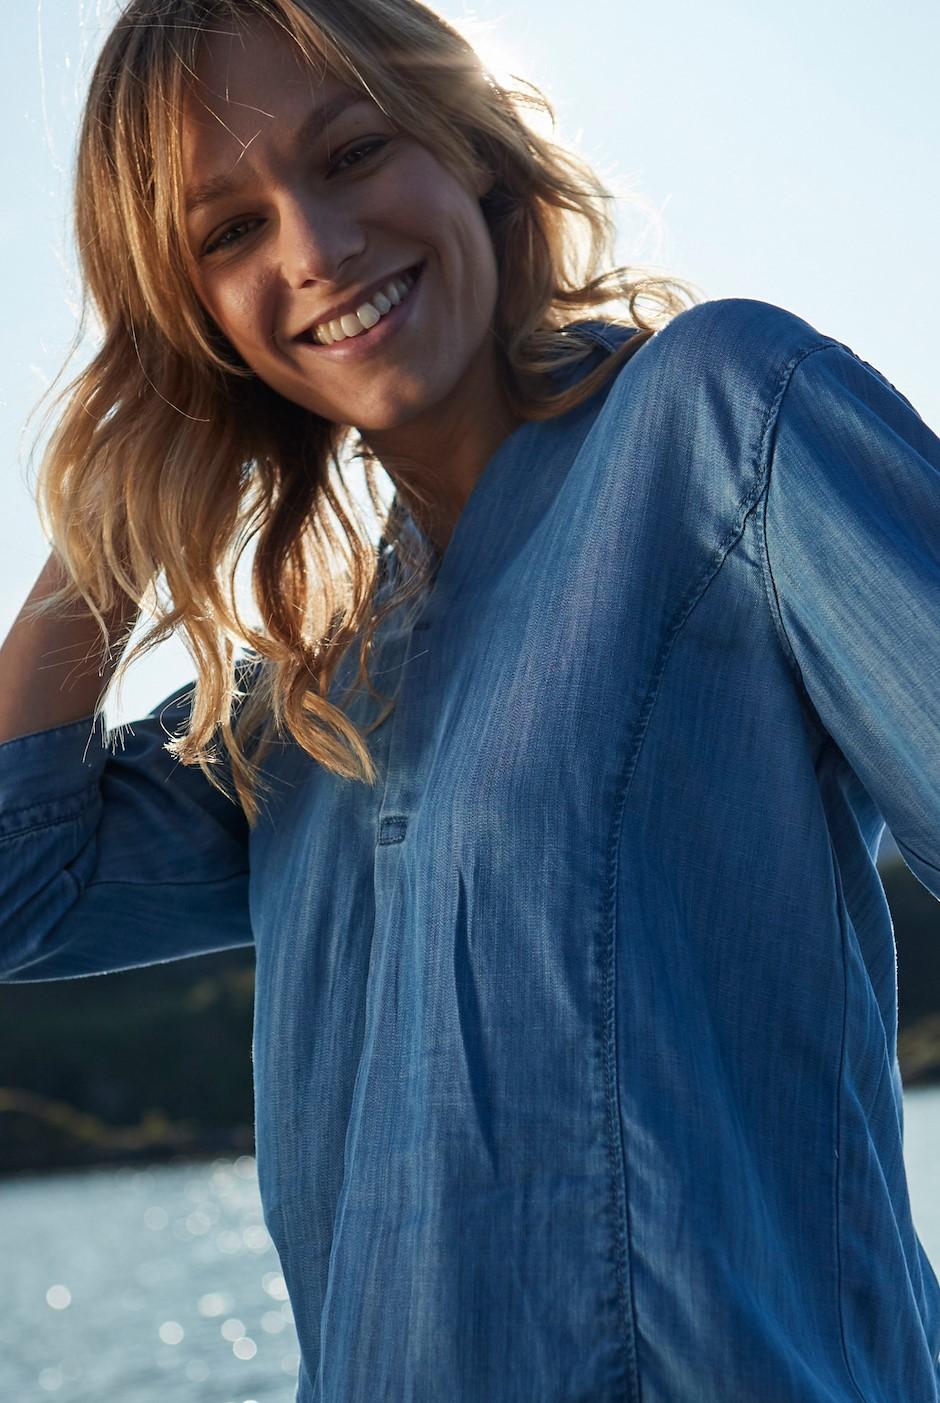 Isabella Tencel Plain Shirt Light Denim